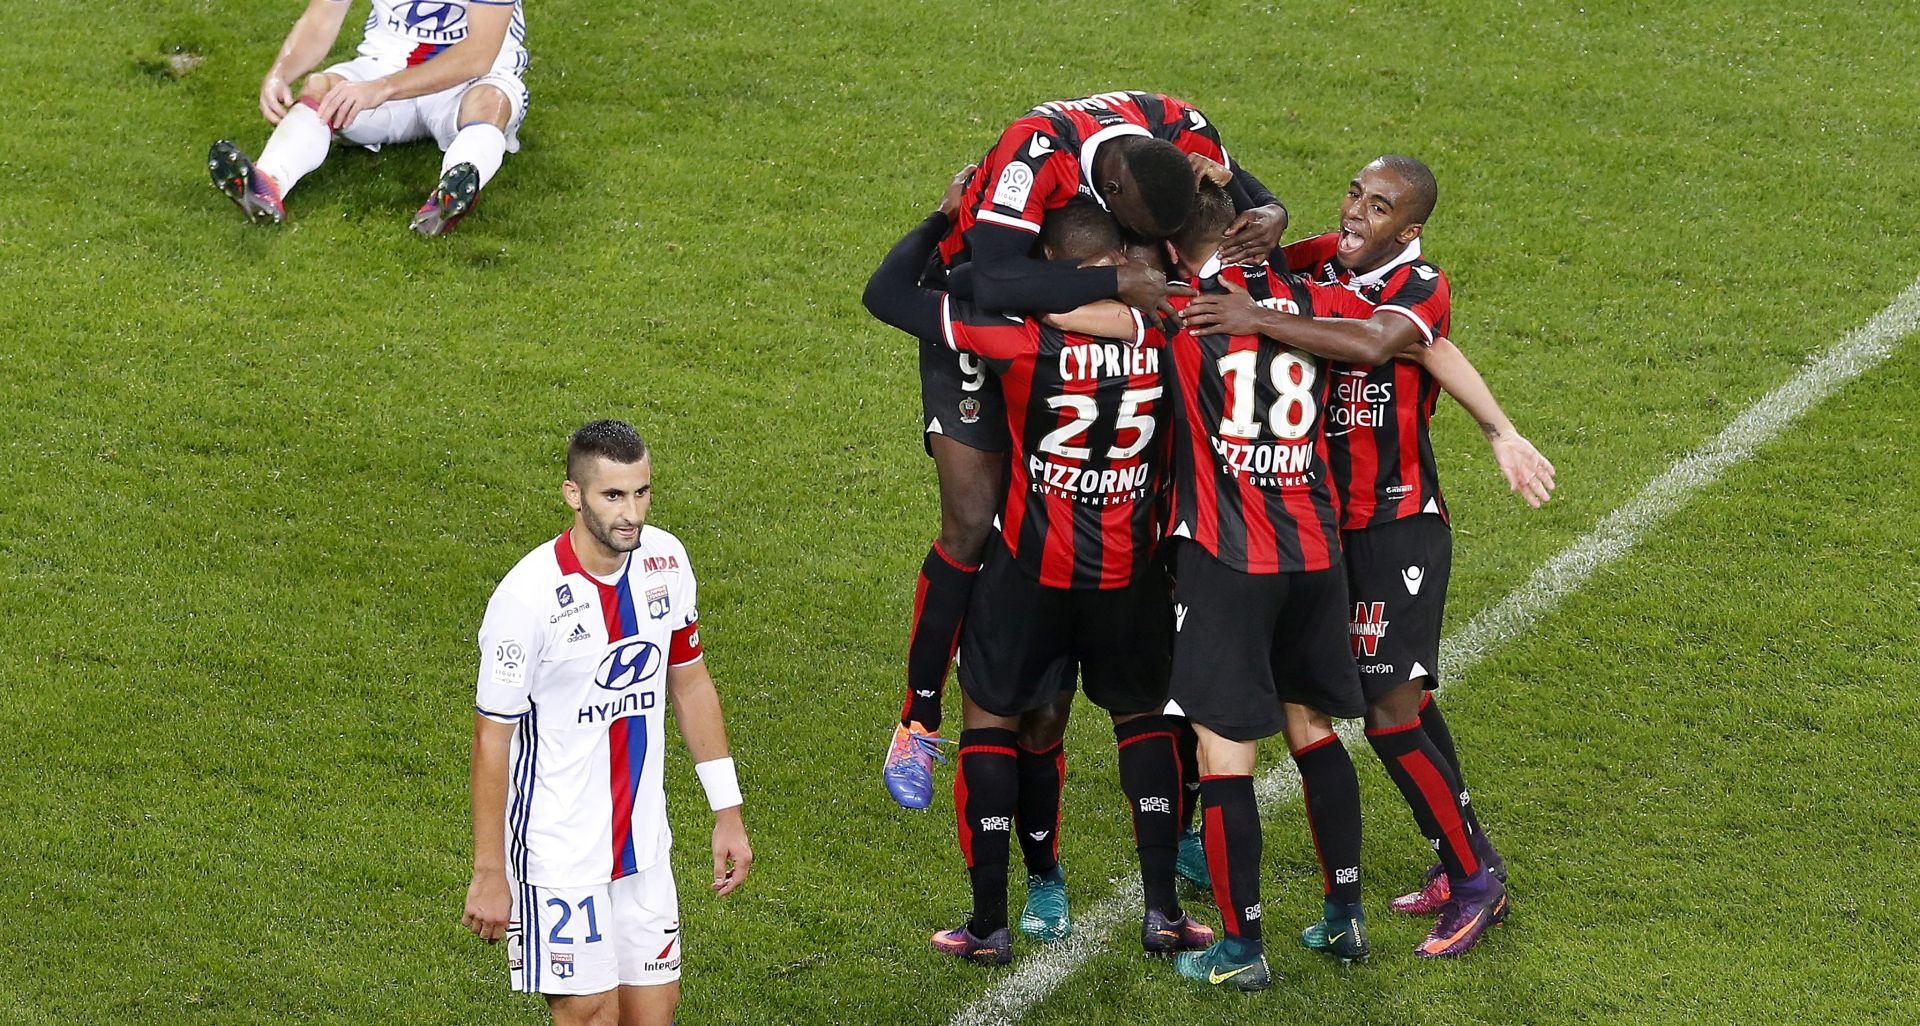 LIGUE 1 Nica nastavlja s pobjedama, Balotelli promašio penal, Subašić primio tri gola